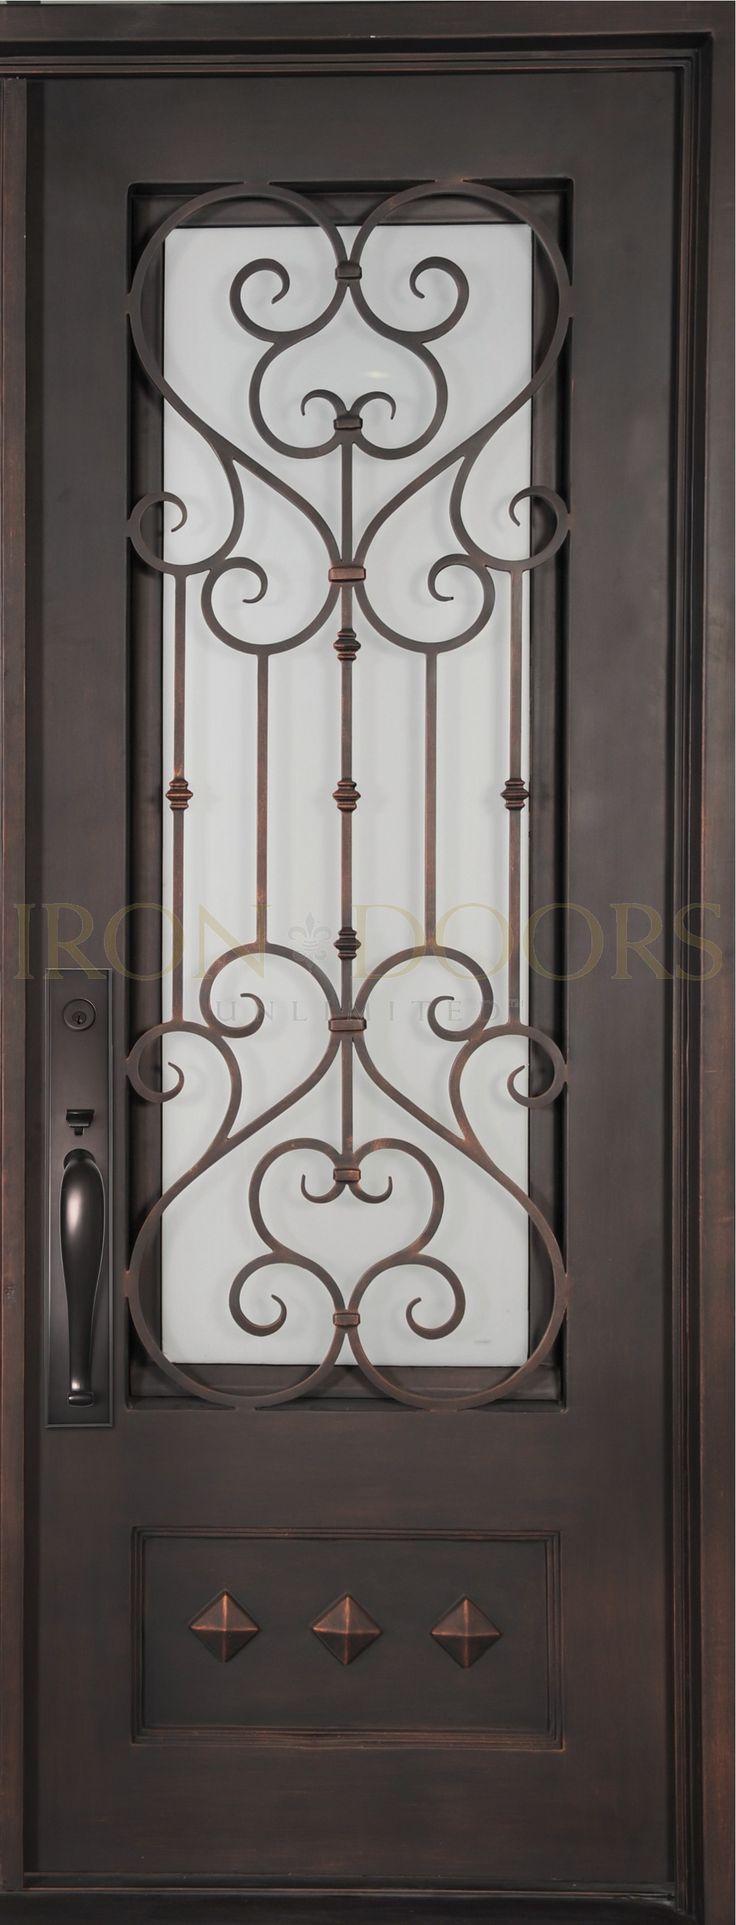 Iron Doors Unlimited - Vita Francese™